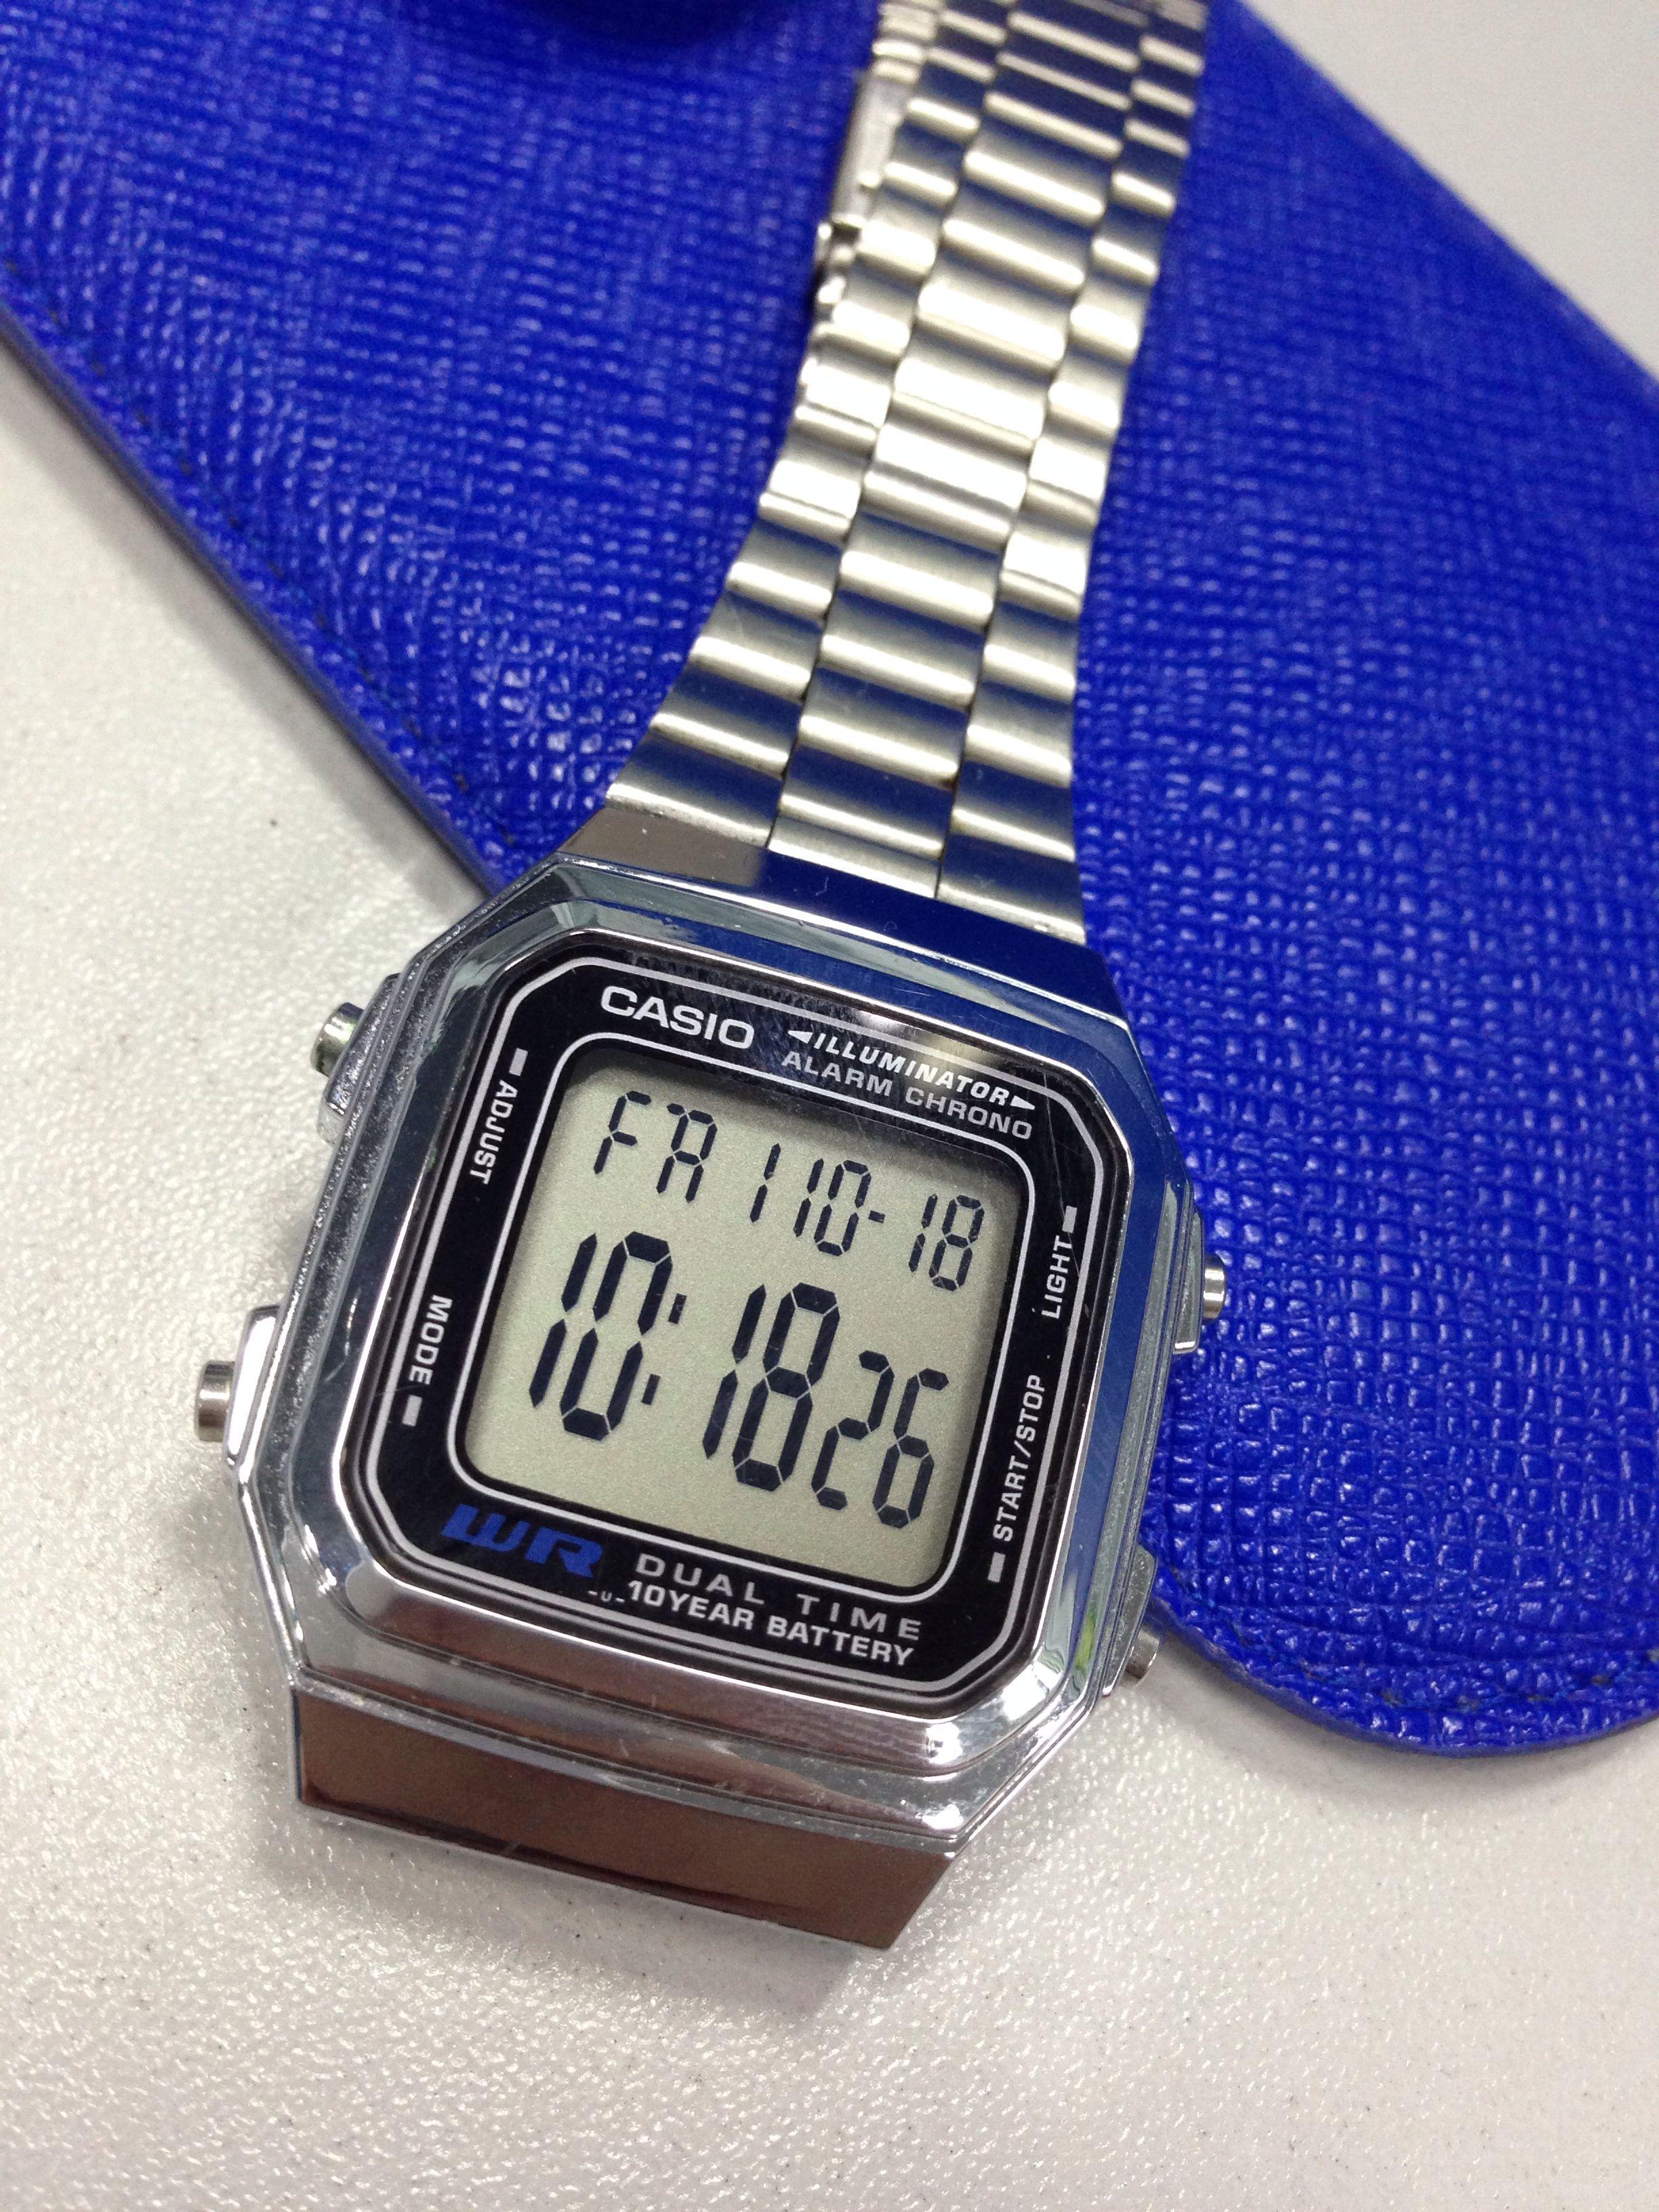 A178w SilverRelojes Reloj A178w Casio Casio In In SilverRelojes wkPX80On